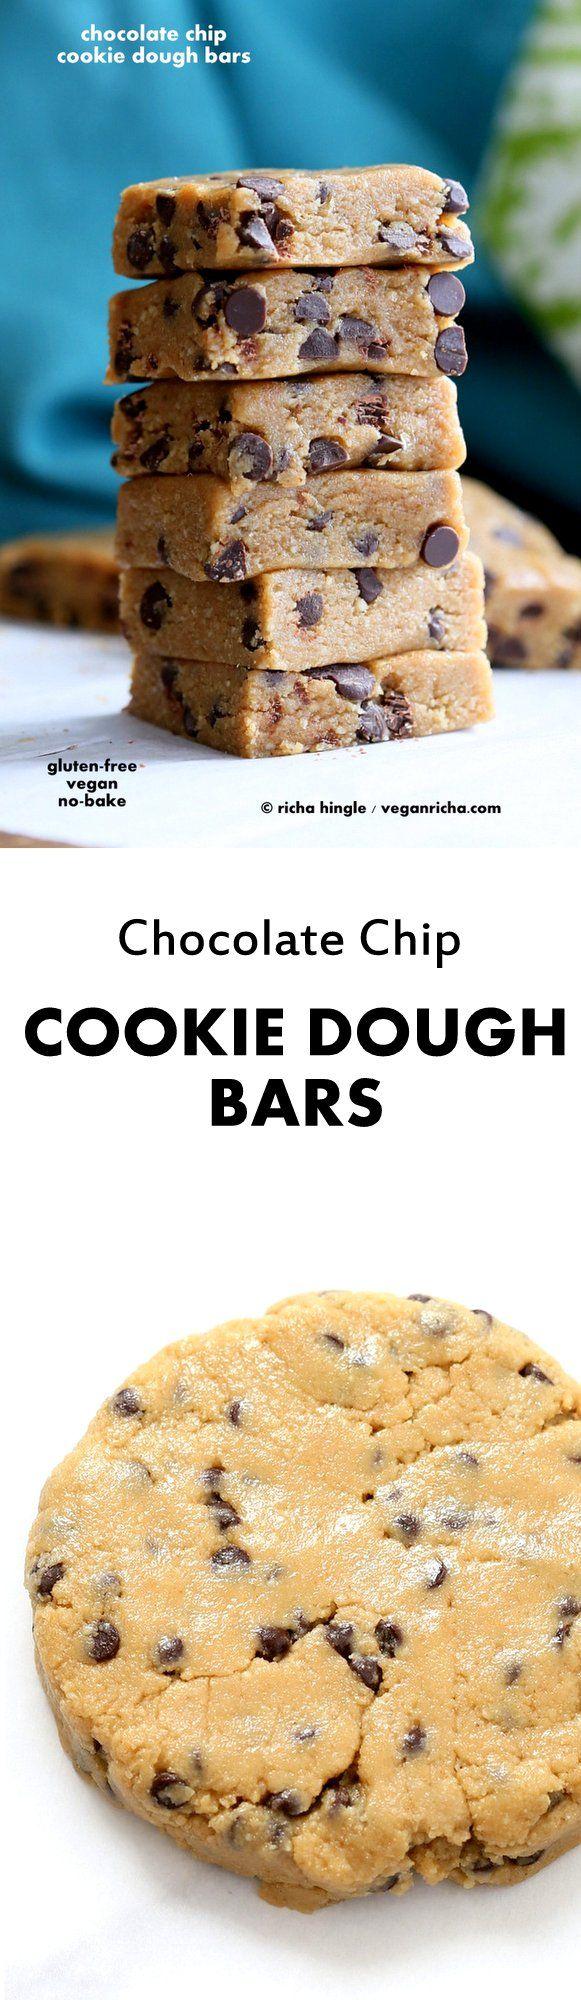 Vegan Chocolate Chip Cookie Dough Bars. No Bake Glutenfree - Vegan Richa